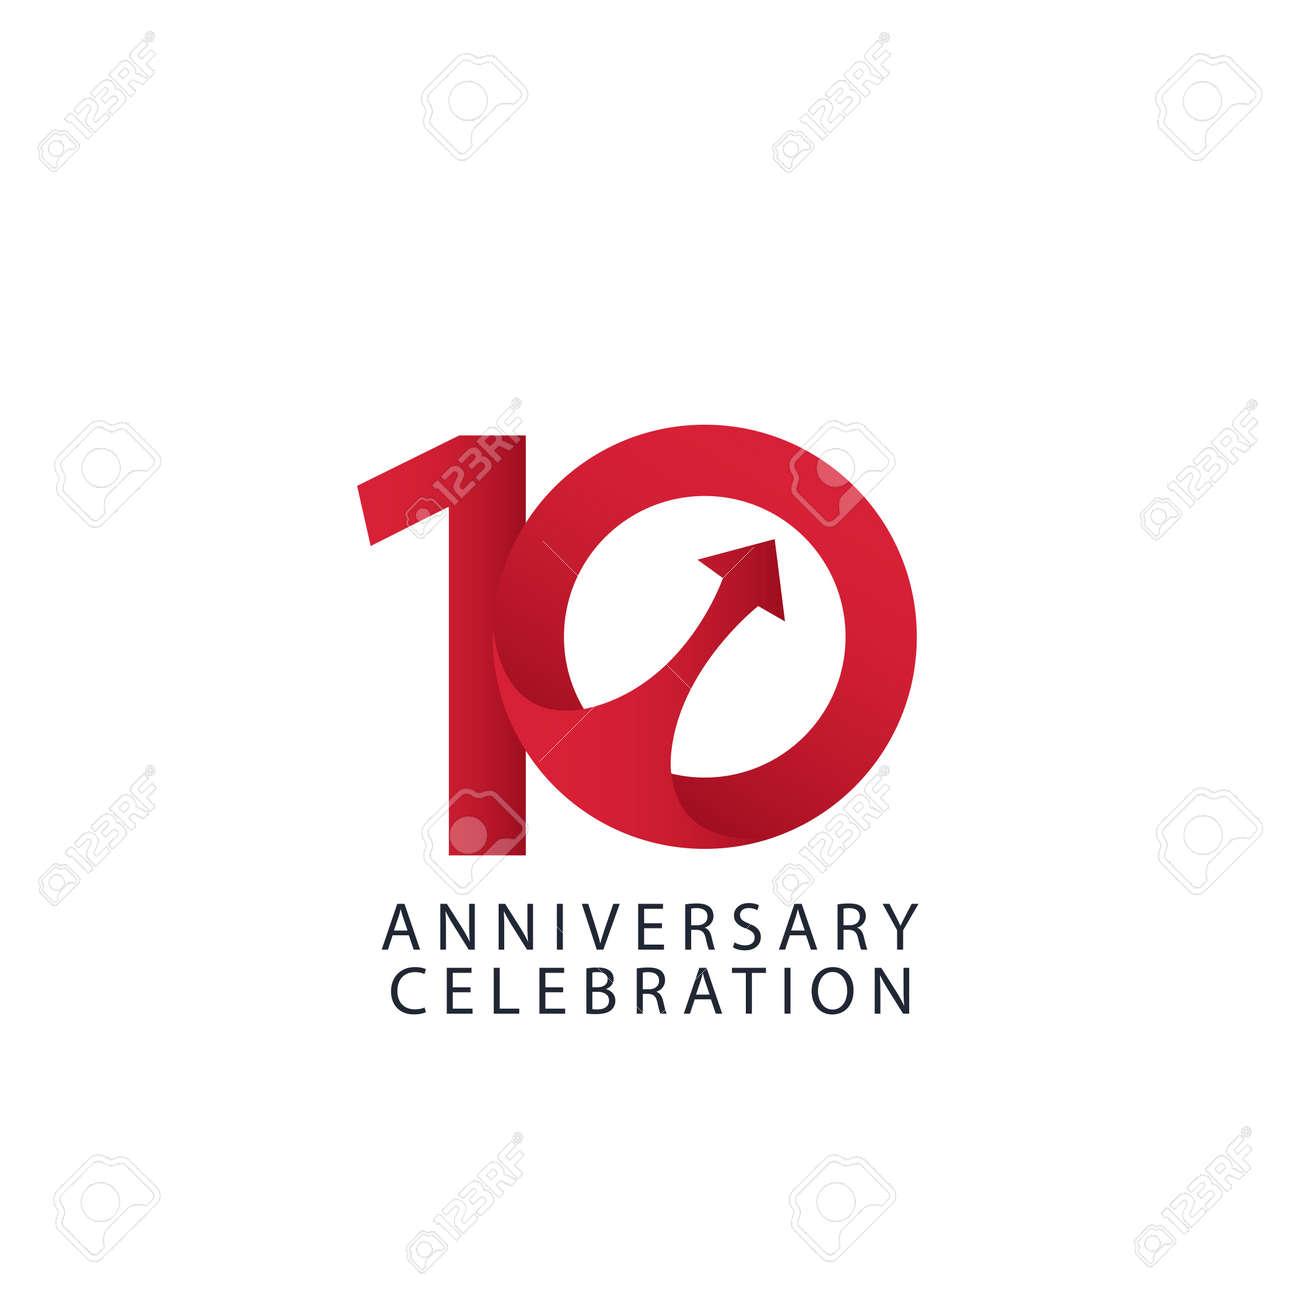 10 Years Anniversary Celebration Vector Template Design Illustration - 163698157